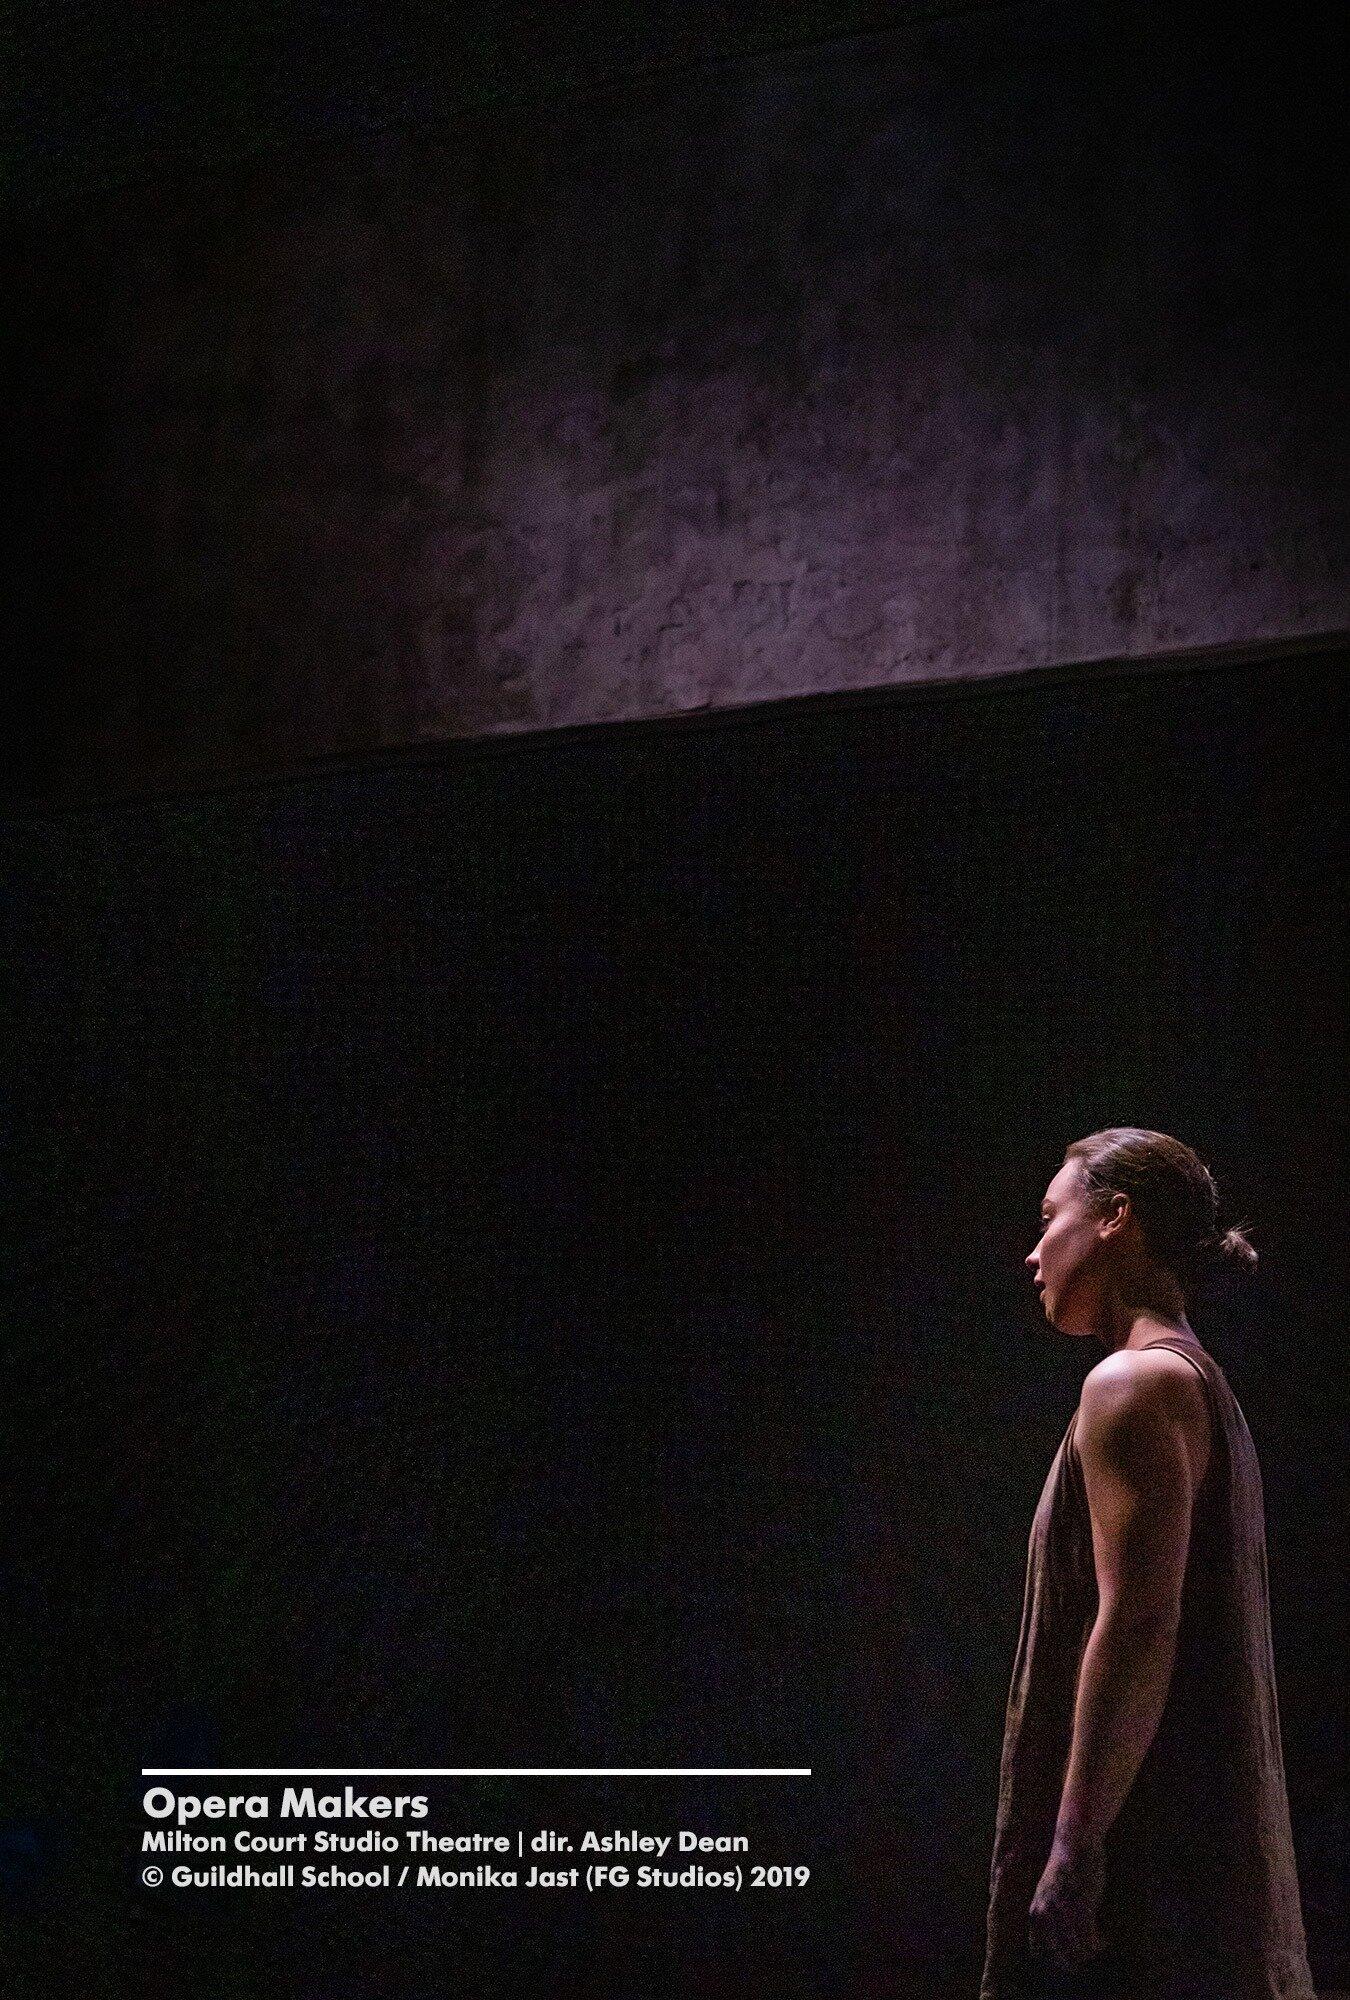 Lara Müller  © Guildhall School : Monika Jast (FG Studios) 2019  'Opera Makers', Guildhall School of Music & Drama, Milton Court Studio Theatre.jpg